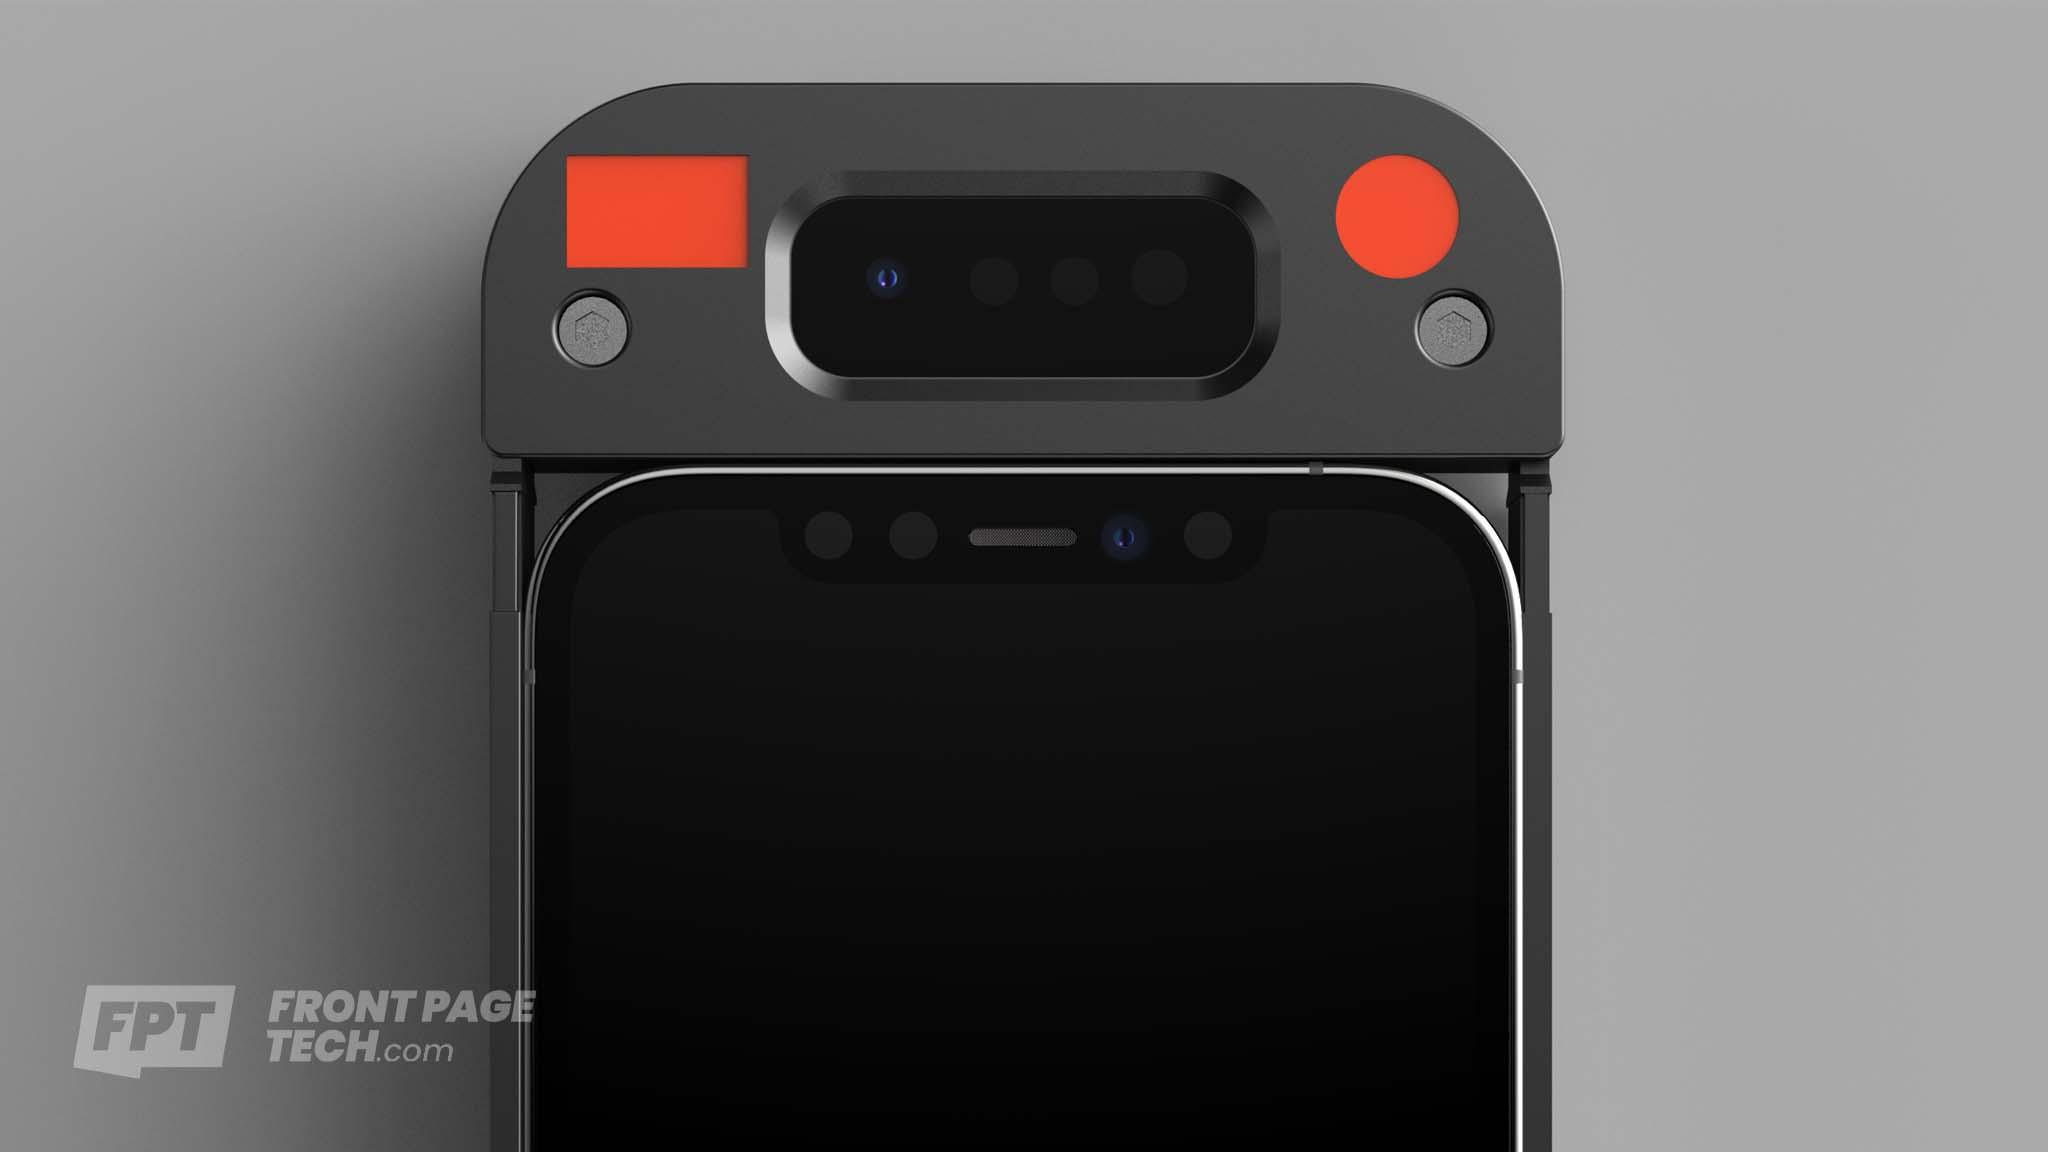 smartfon apple iphone 13 prototyp face id smartphone prototype